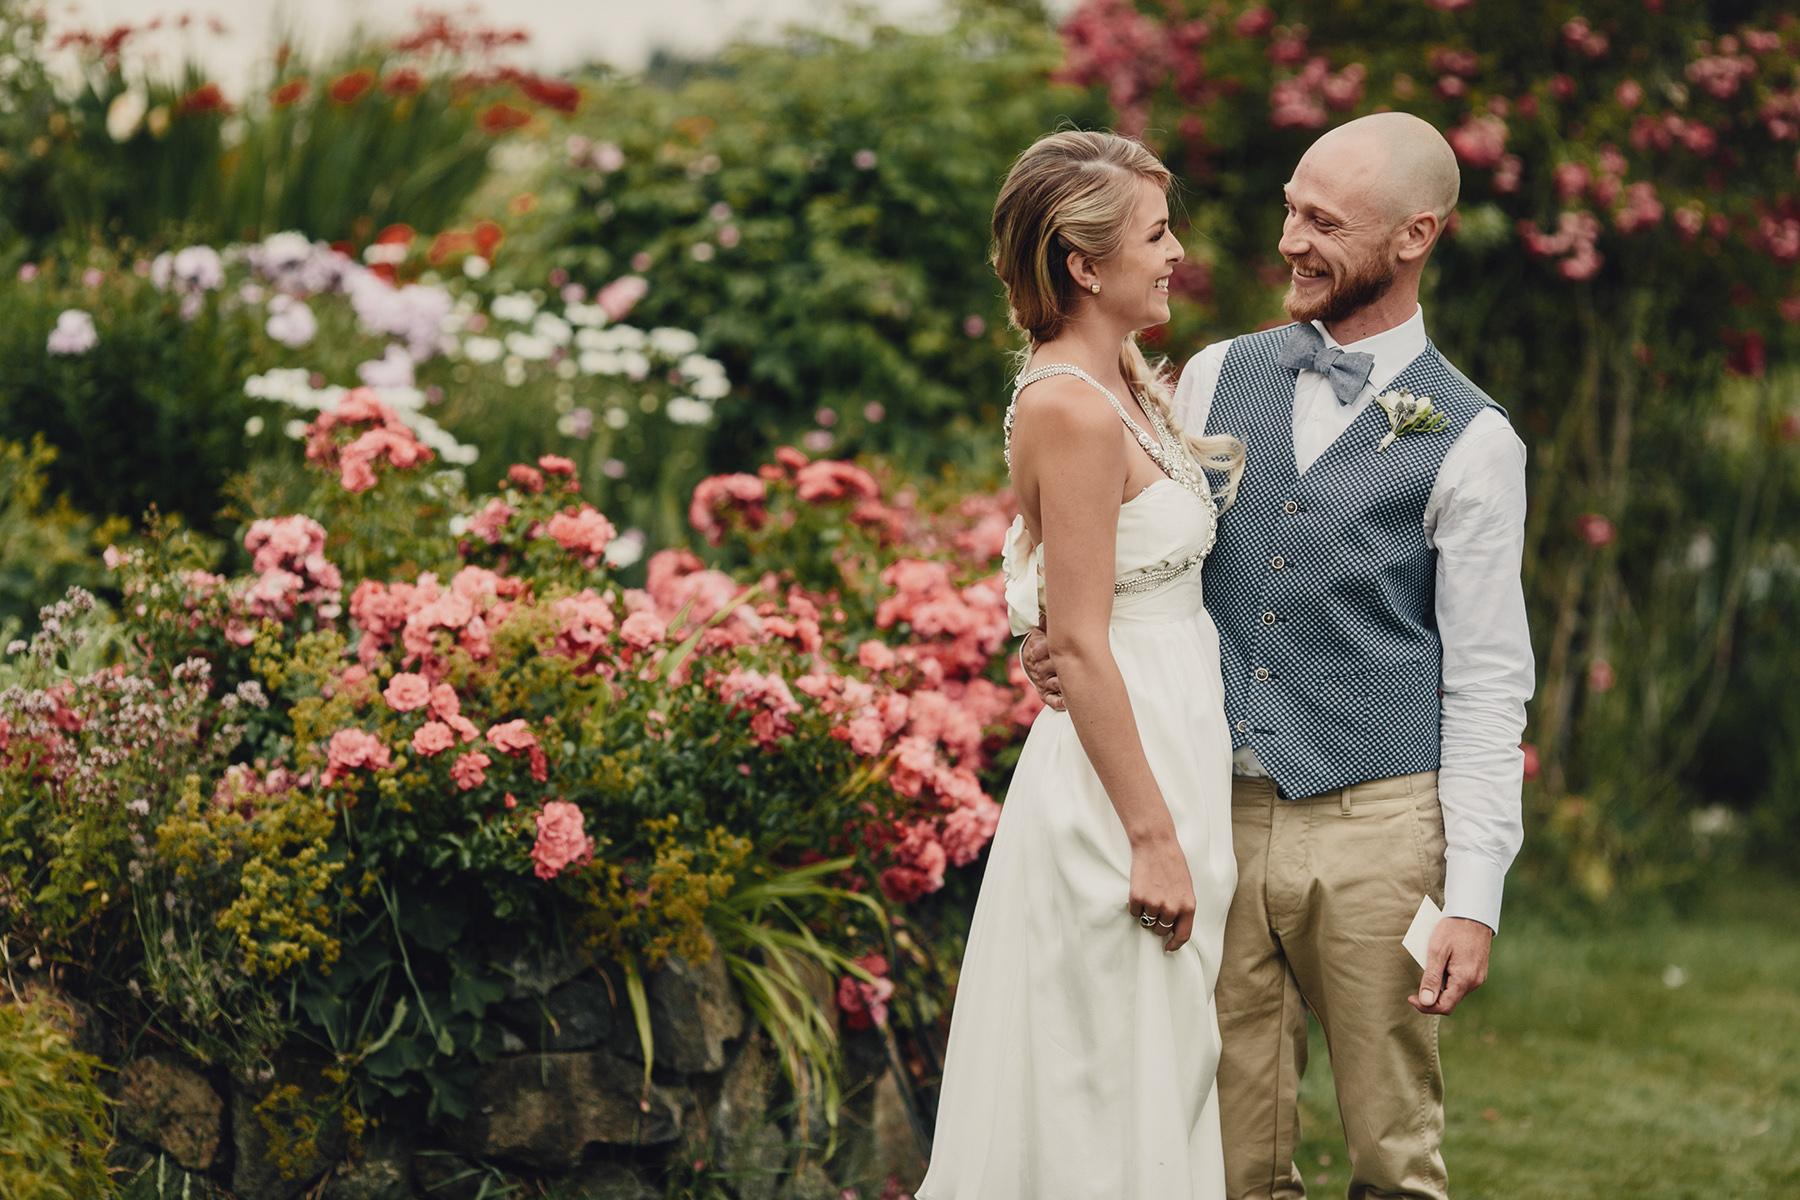 kildara-farms-wedding-photo-inspiration-0023